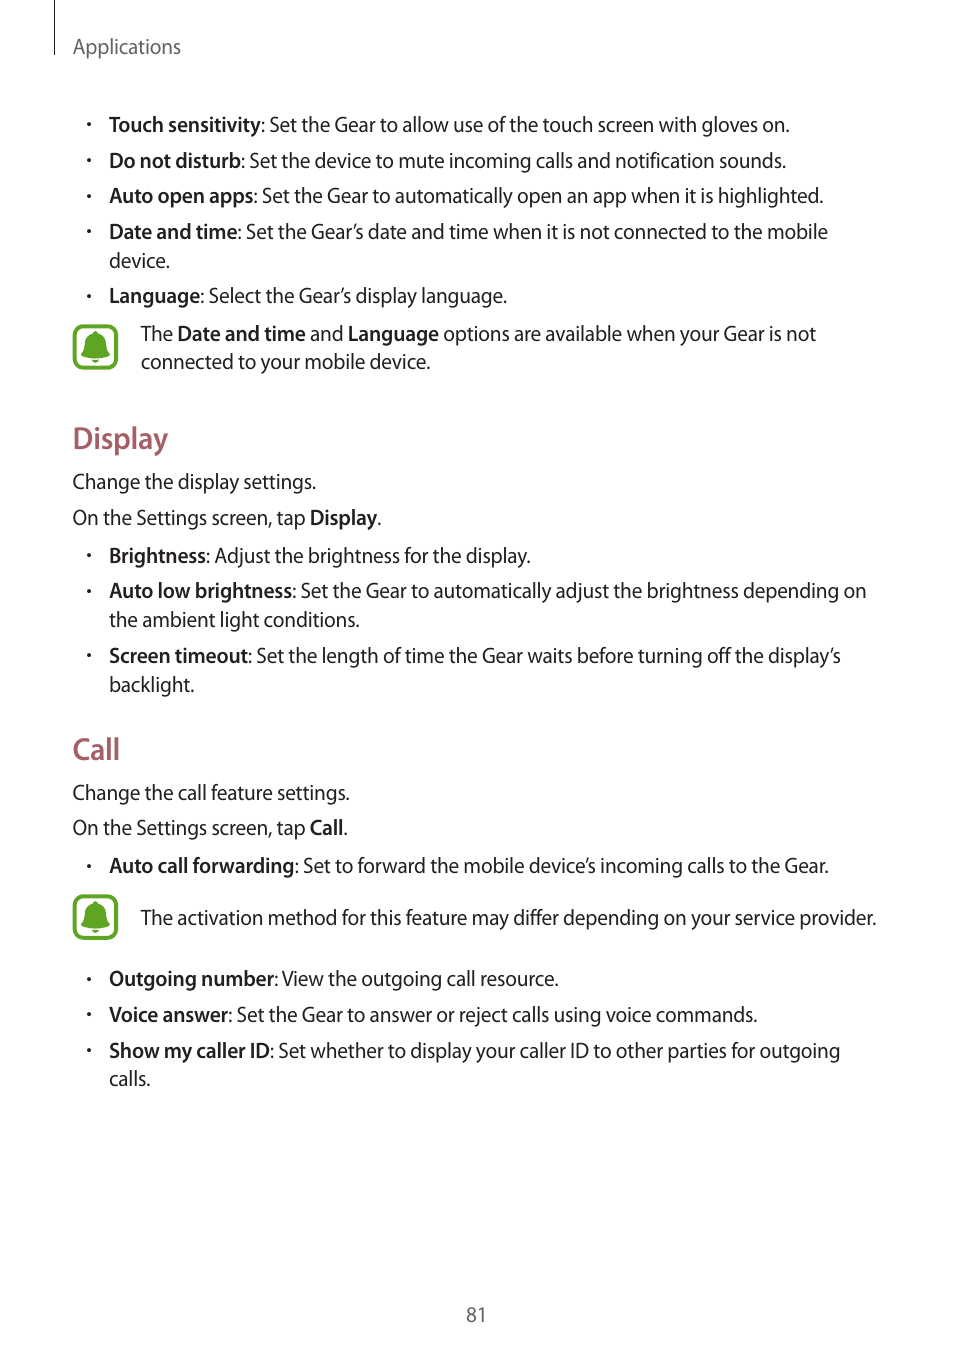 Display, Call, 81 display 81 call | Samsung Gear S3 SM-R760